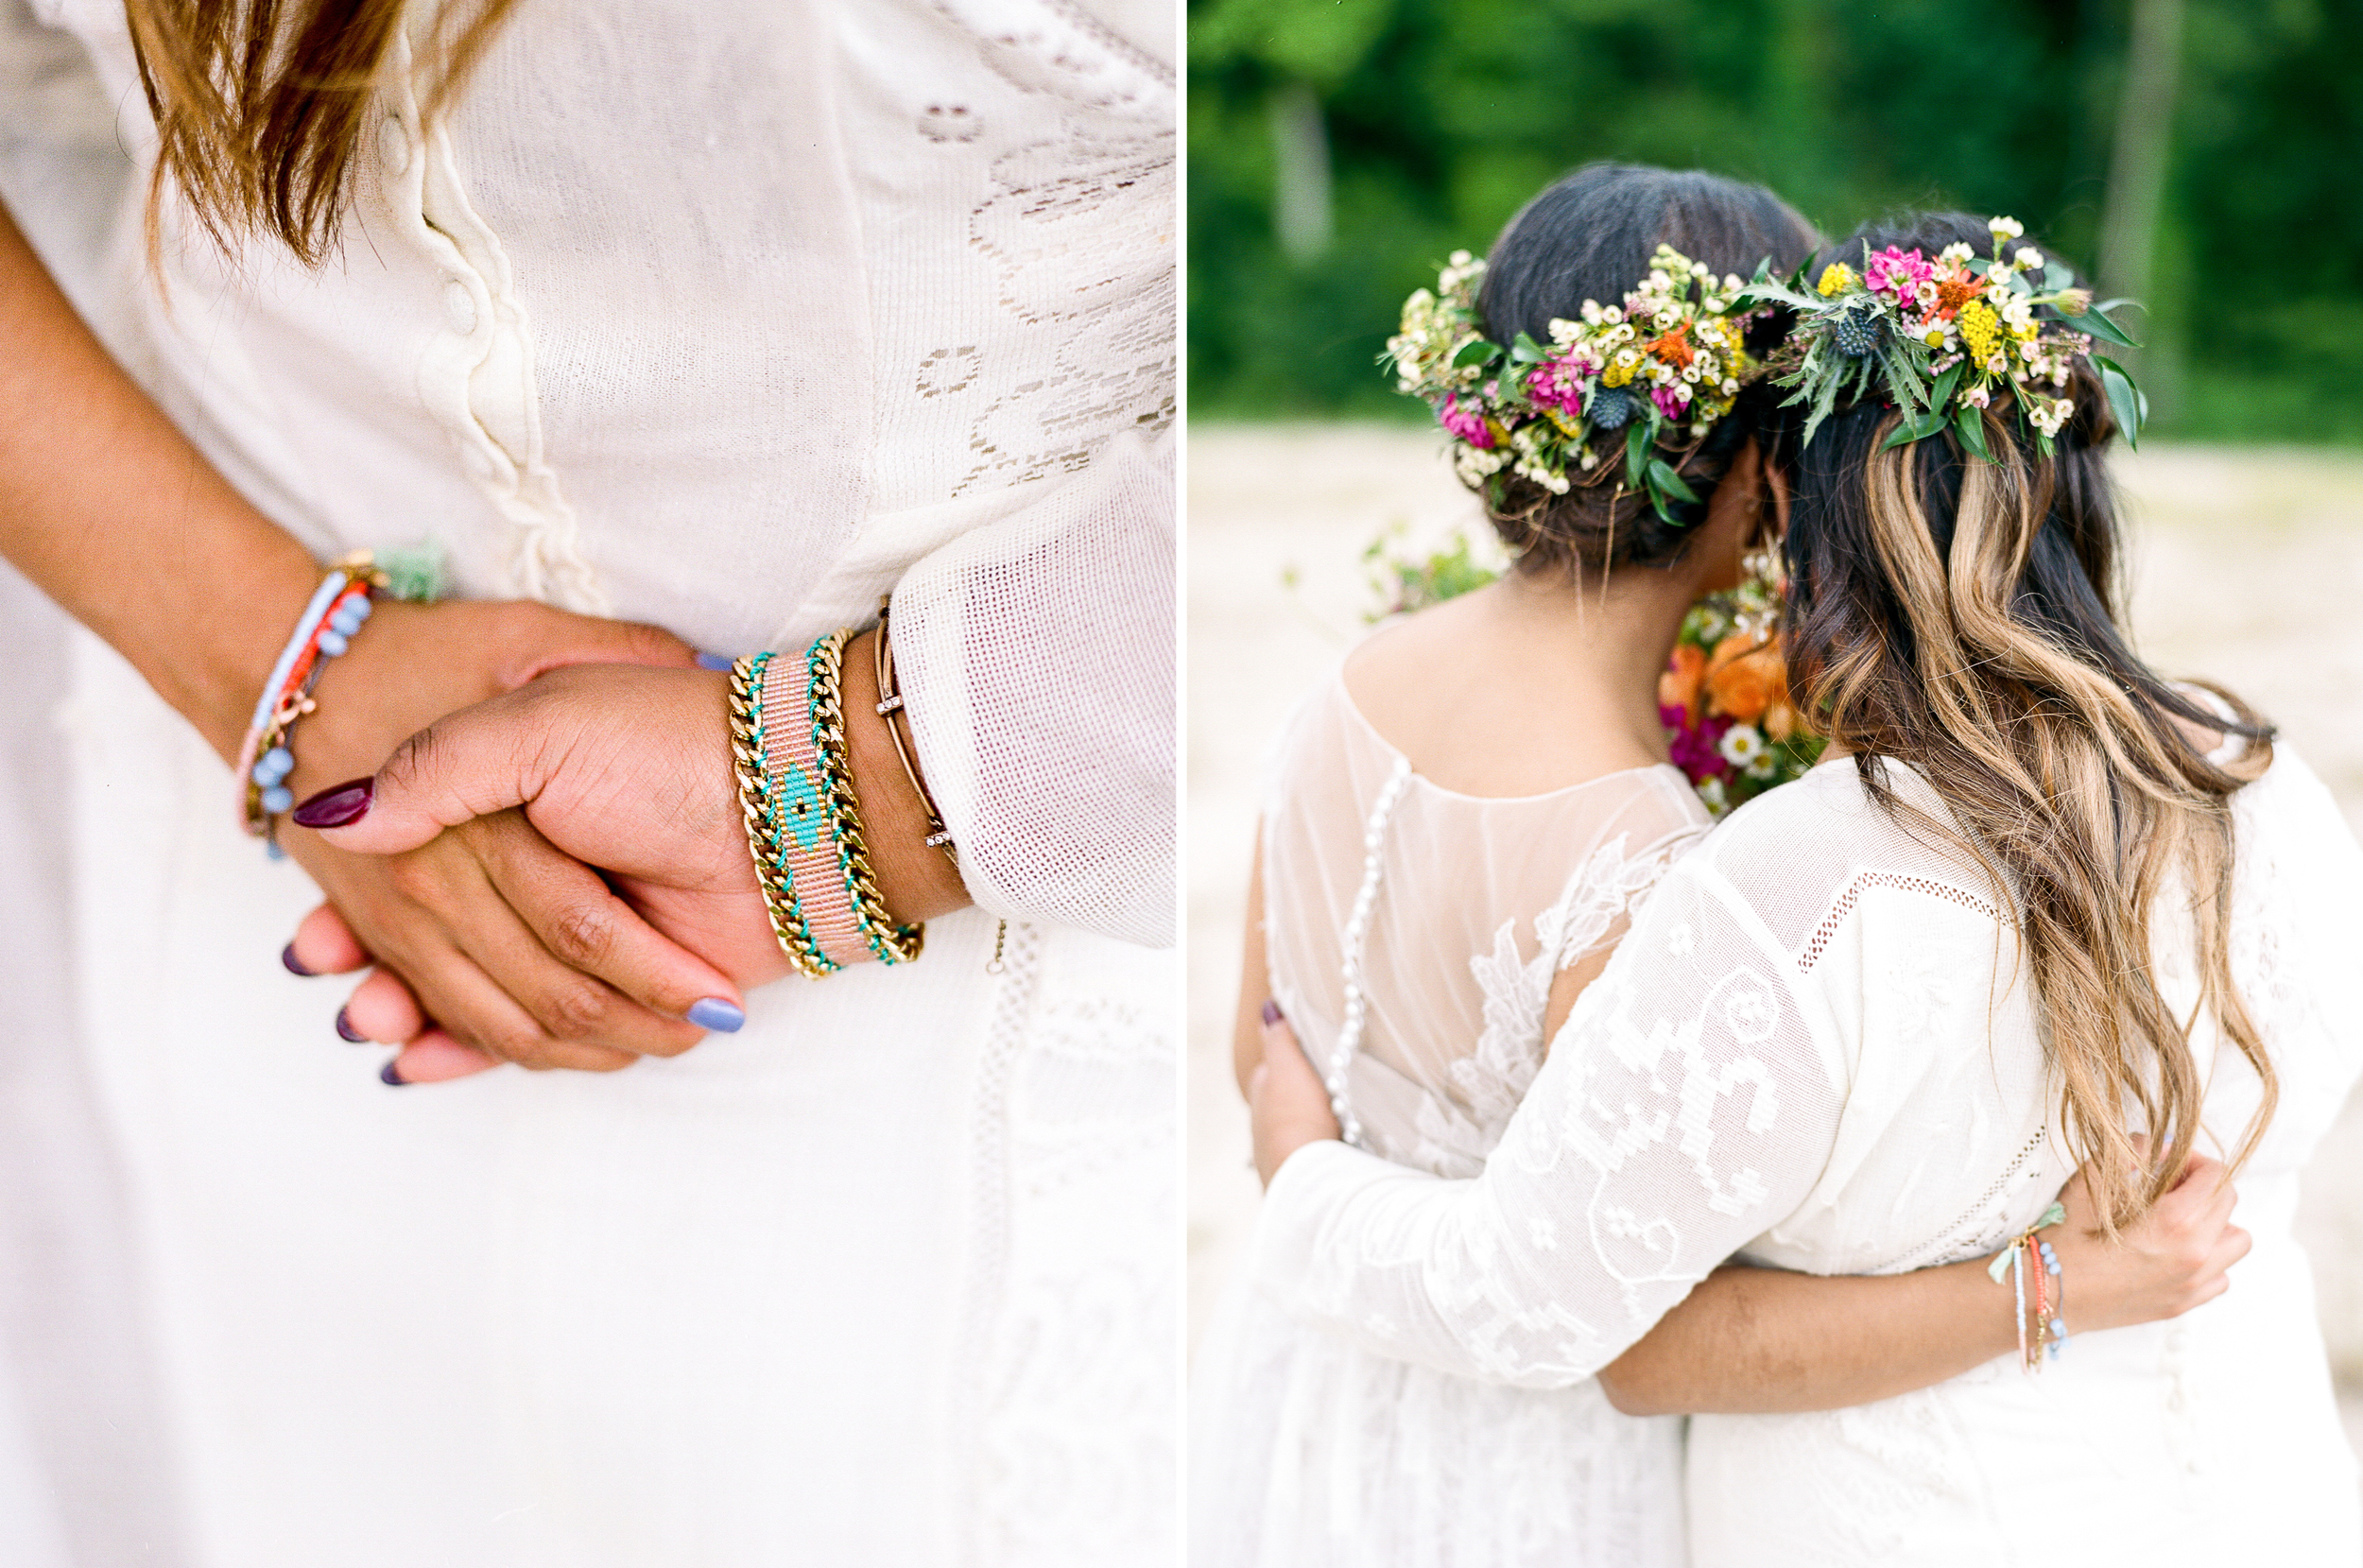 Dana-Fernandez-Photography-Martha-Stewart-Weddings-Houston-Texas-Wedding-Photographer-Film-109.jpg